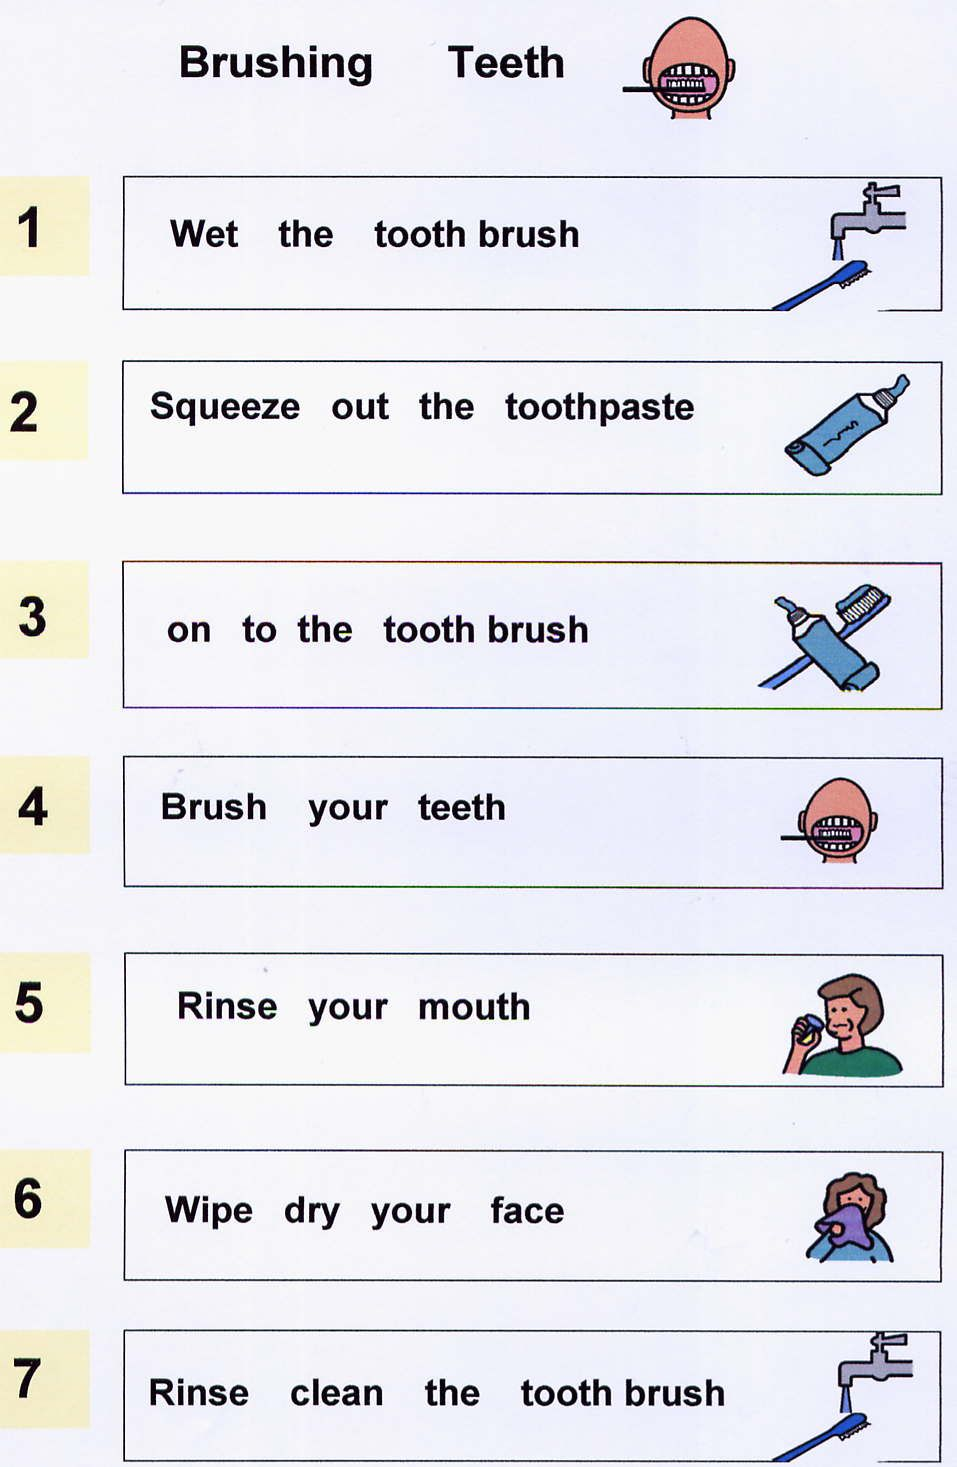 medium resolution of How To Brush Your Teeth Worksheet - Nidecmege